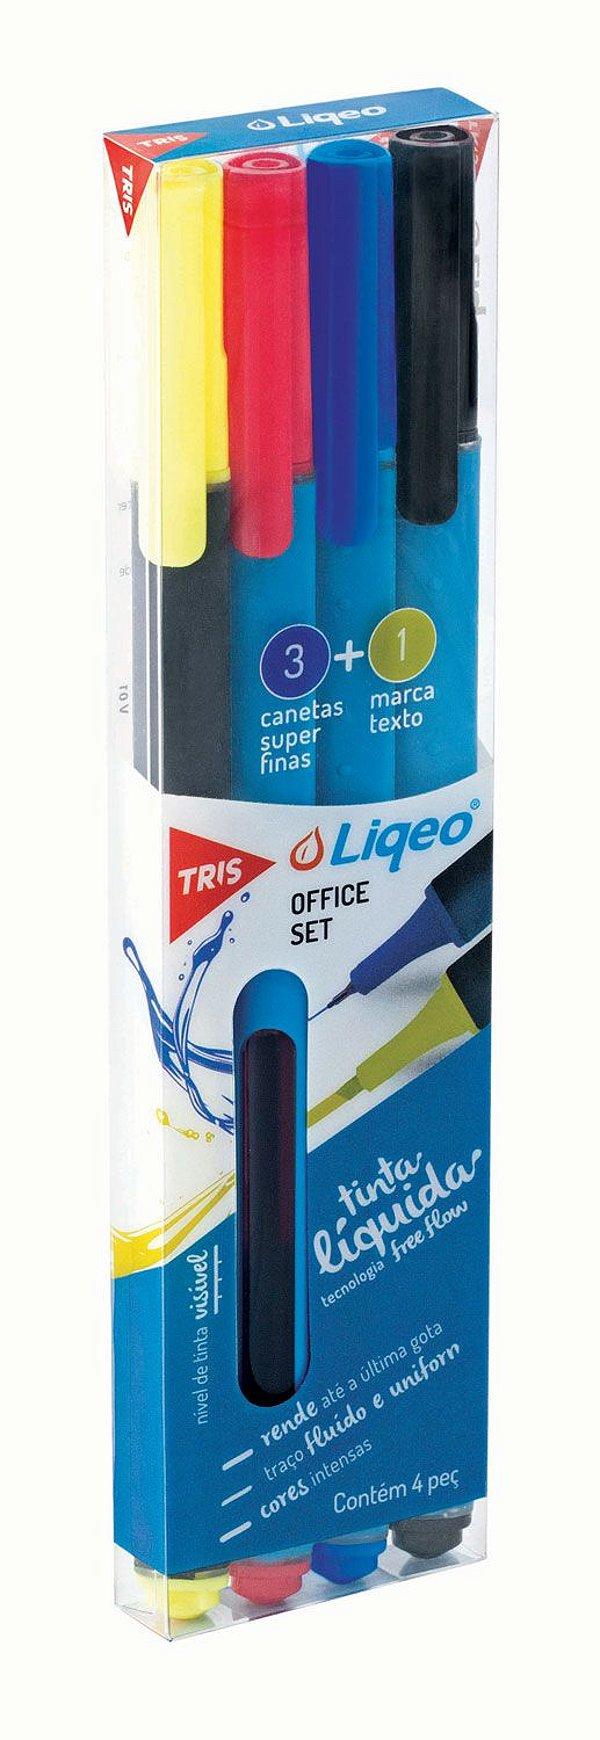 Caneta Hidrográfica 0.4mm Liqeo 3 Cores + Marca Texto - Tris